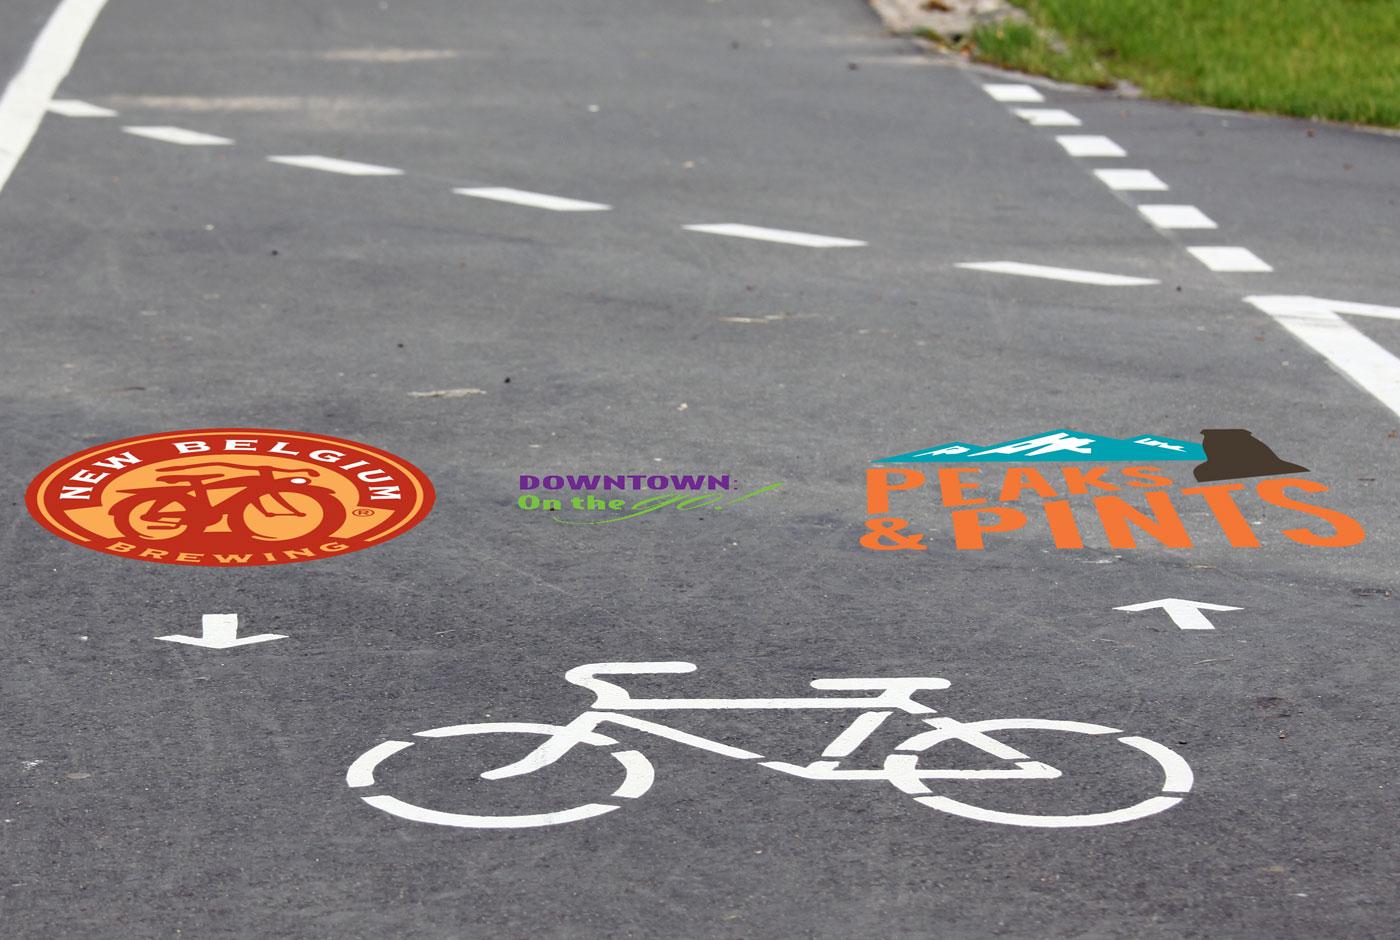 New-Belgium-Bike-and-Beer-Night-Tacoma-2019-calendar